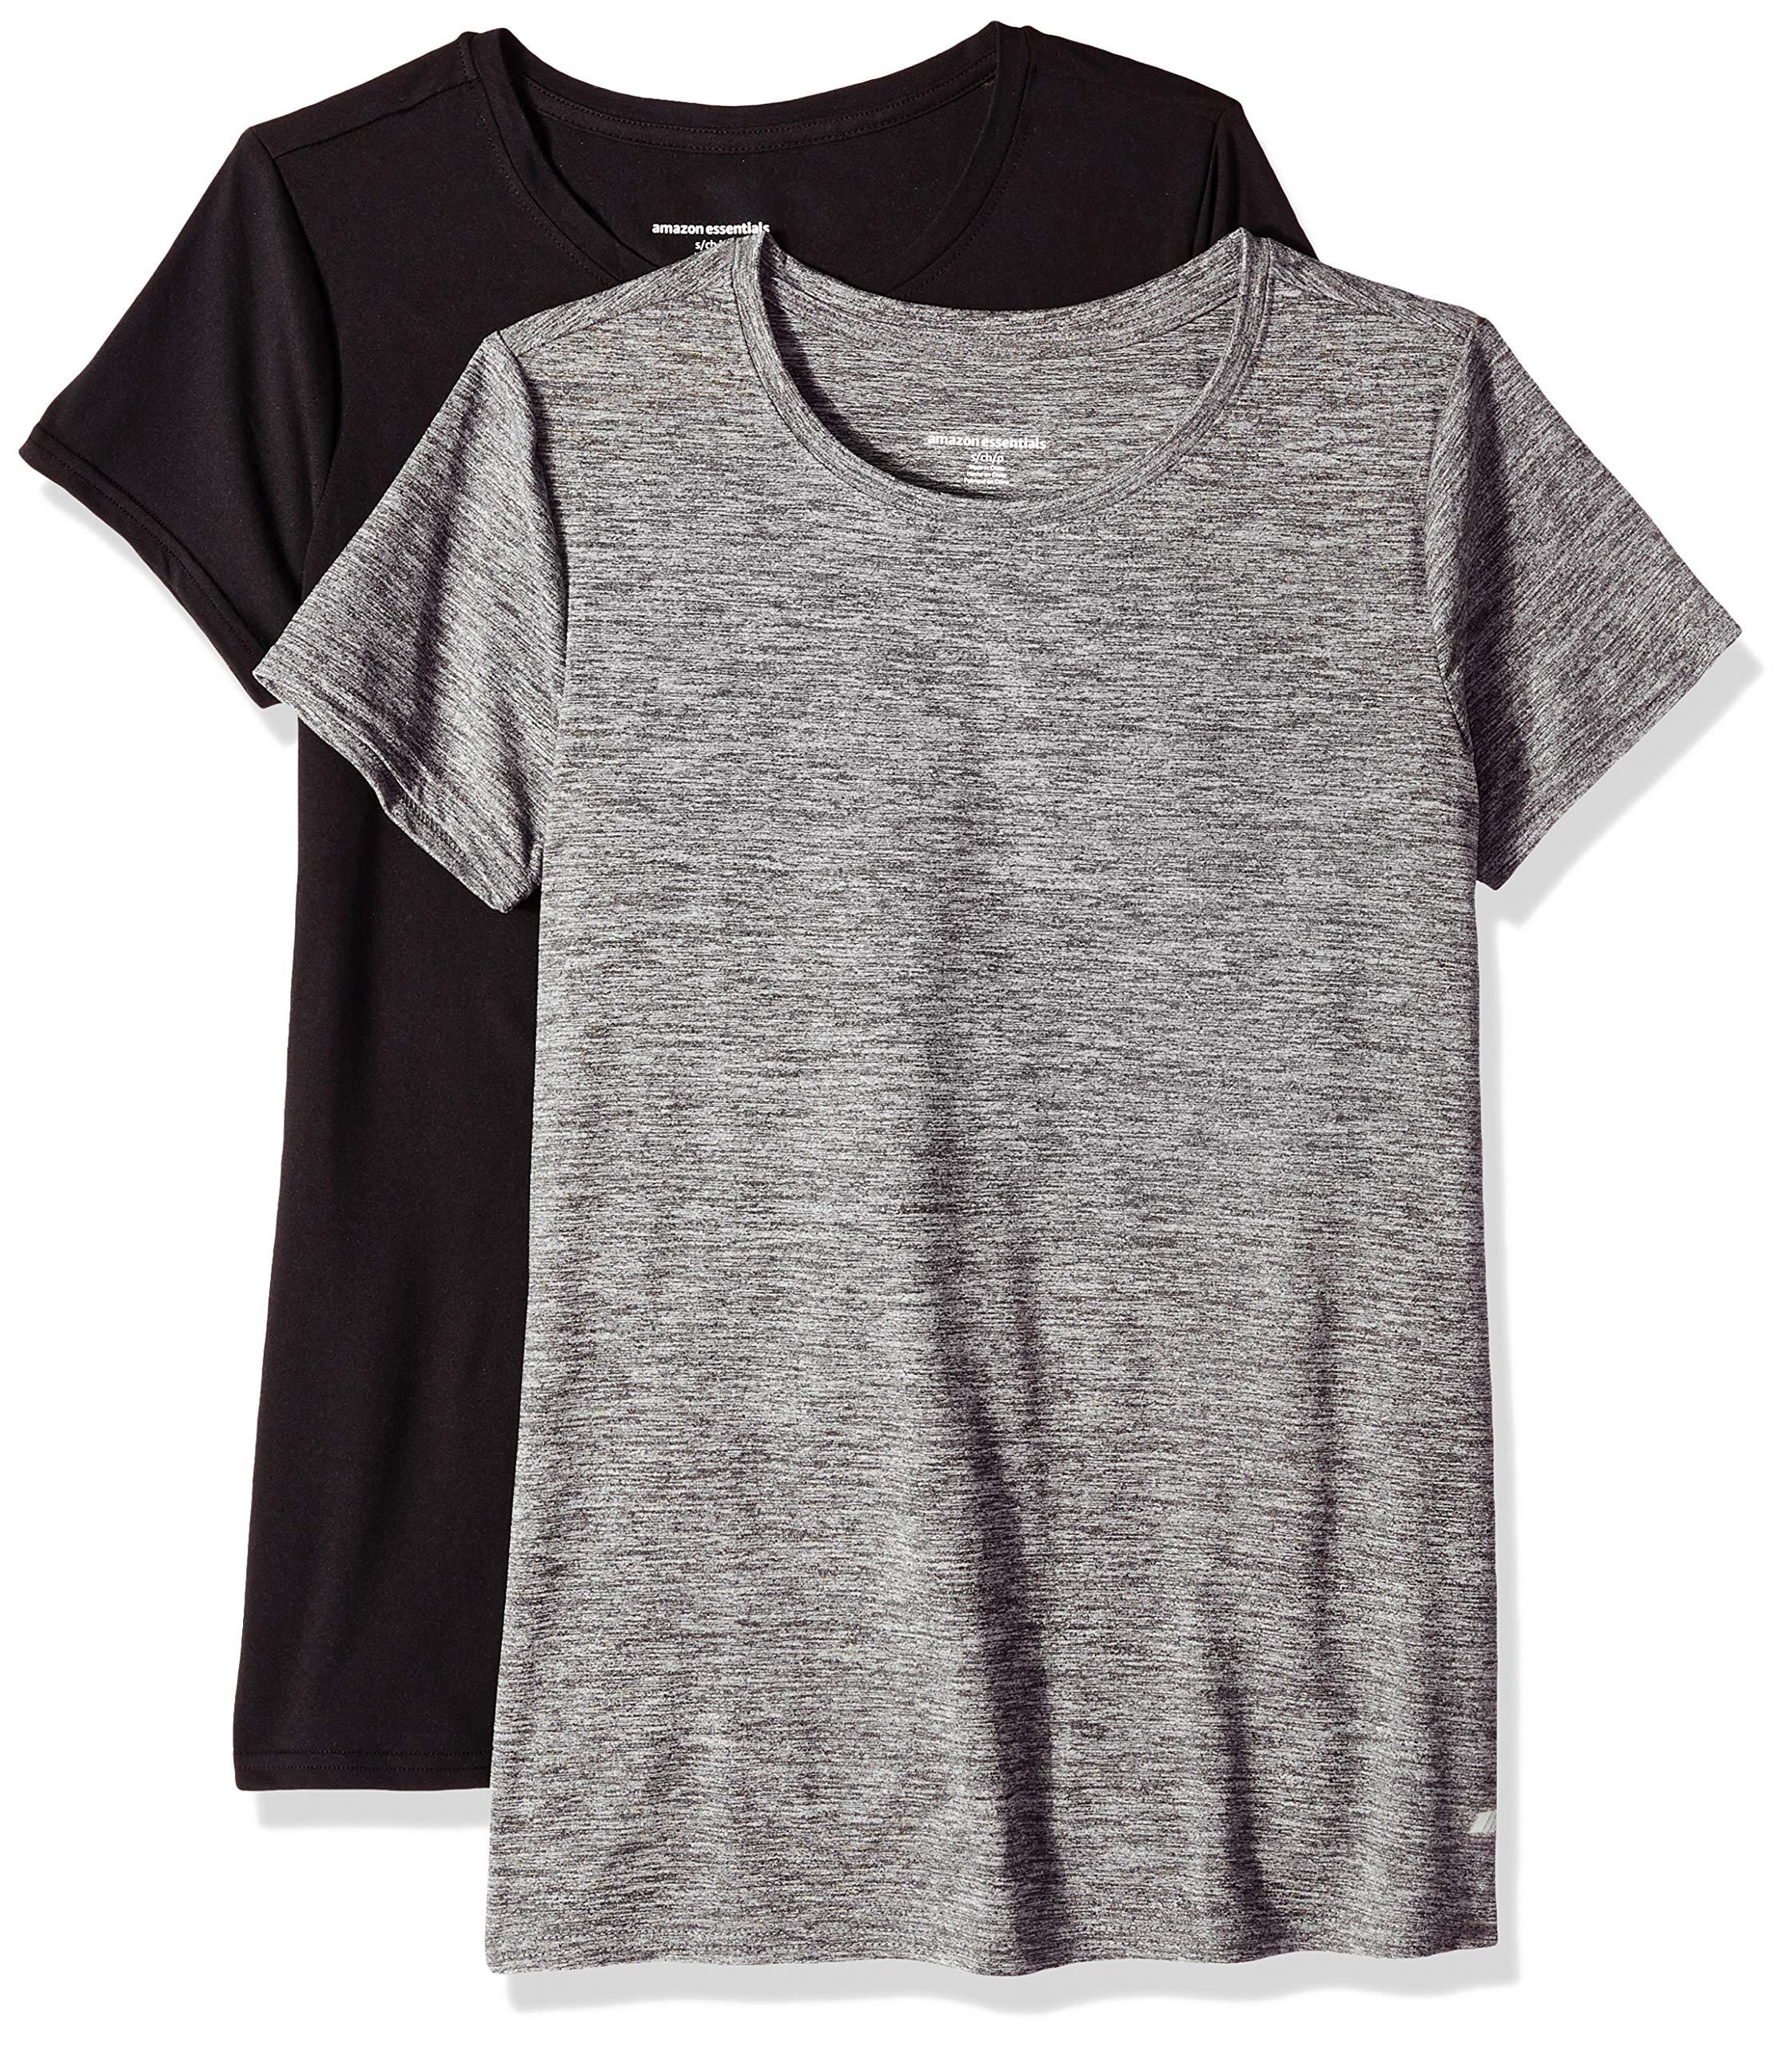 Amazon Essentials Women's 2-Pack Tech Stretch Short-Sleeve Crewneck T-Shirt, -black space dye/black, X-Small